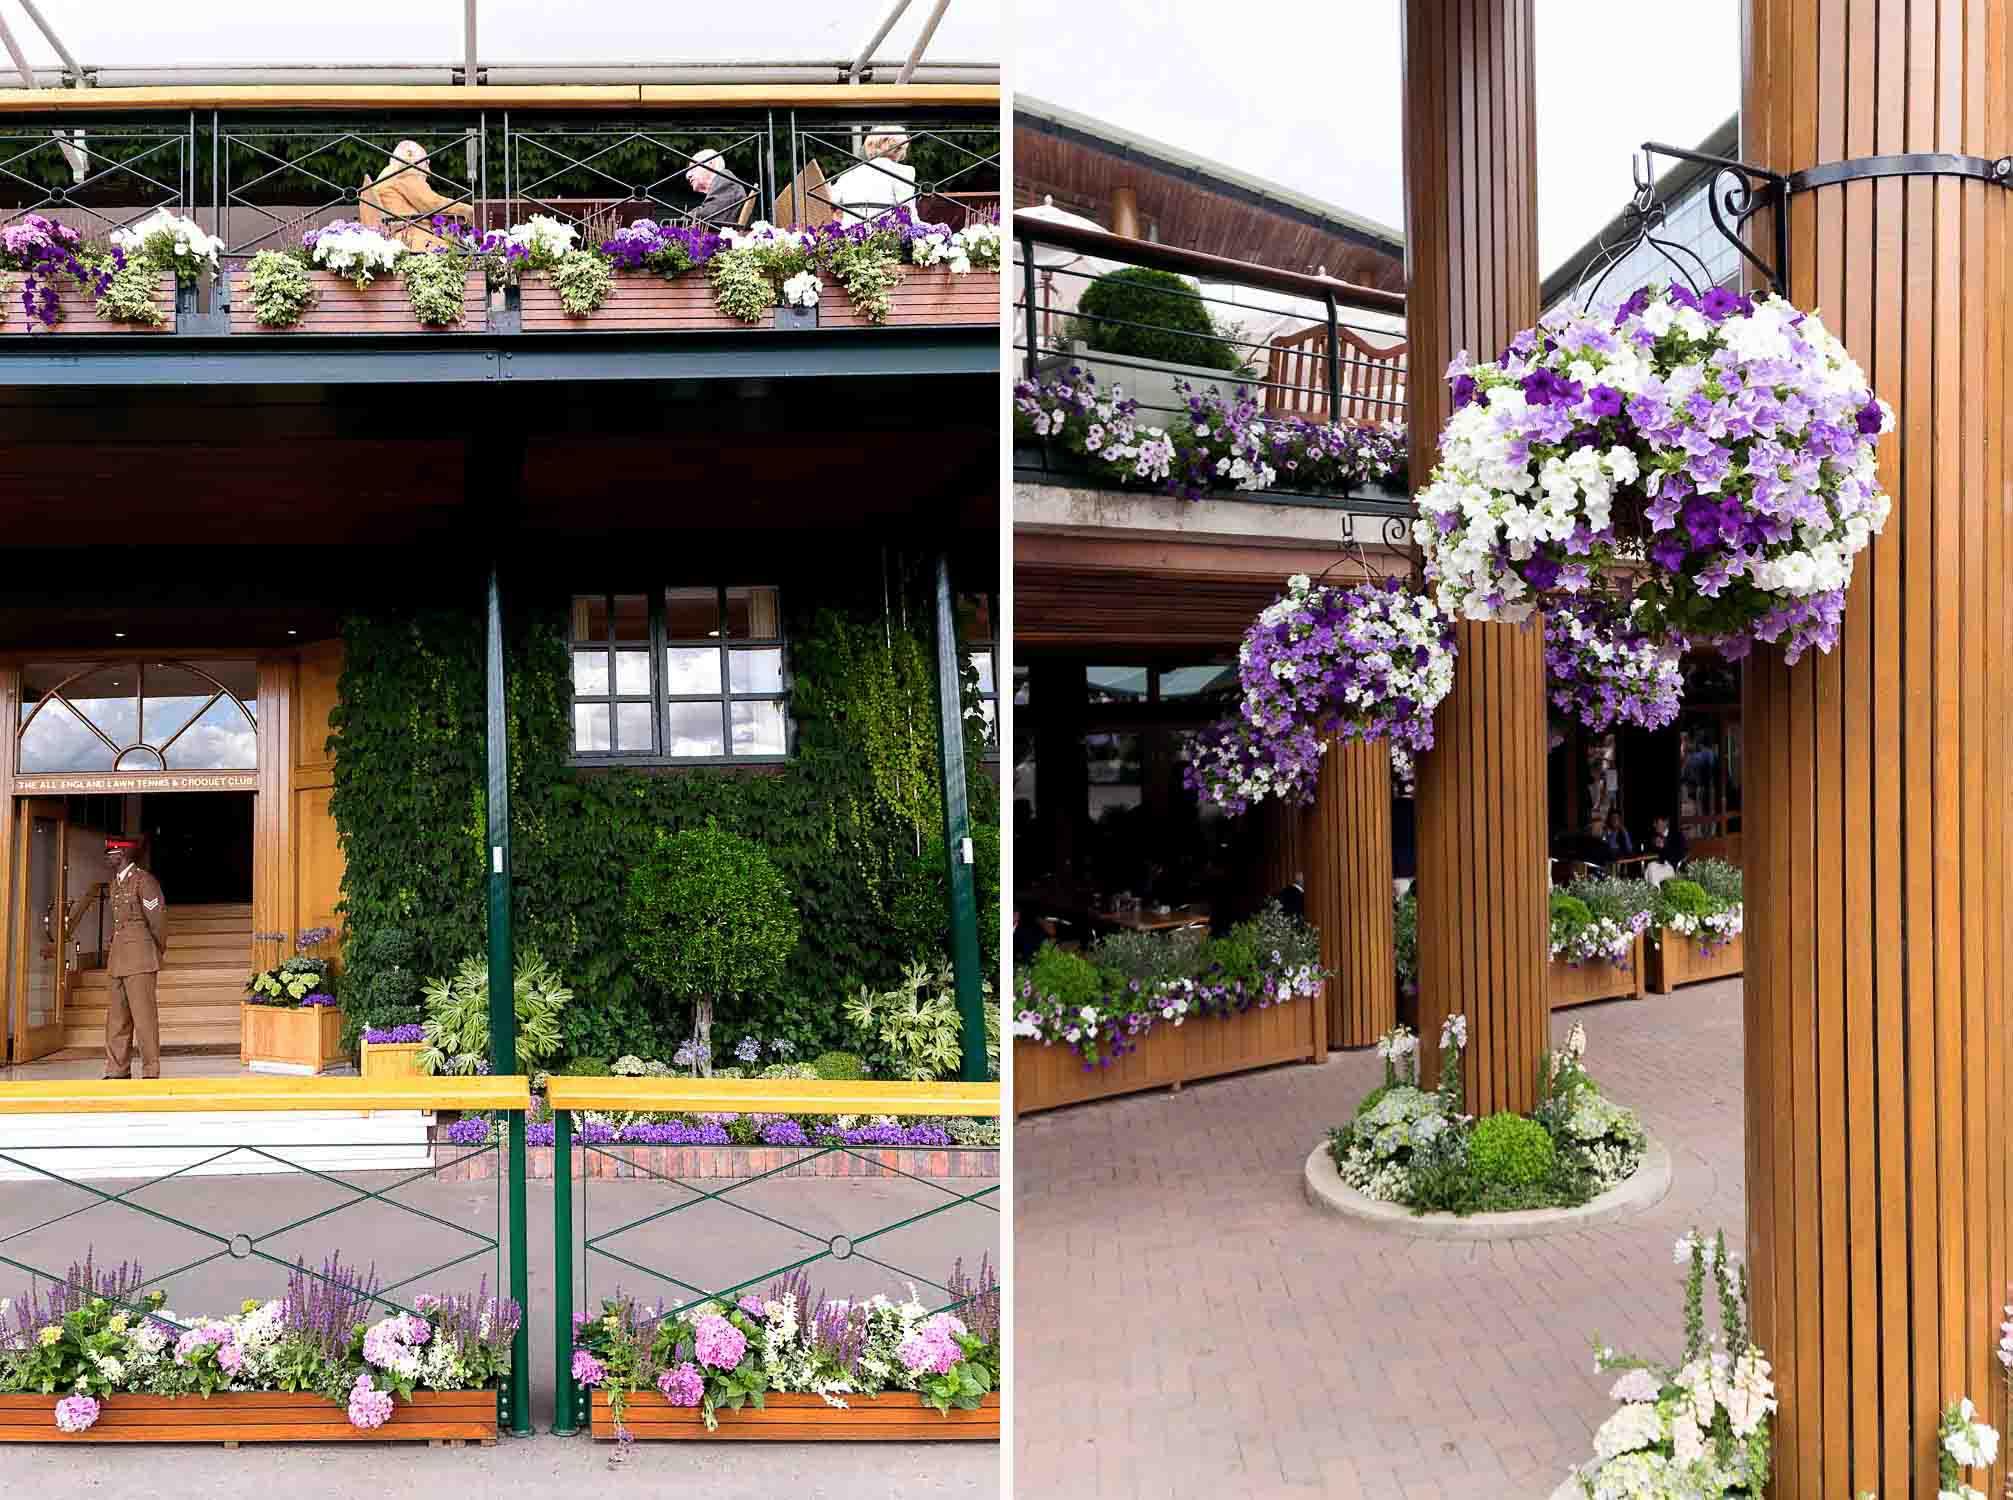 Wimbledon 2017 Tennis Championship at All England Lawn Tennis and Croquet Club